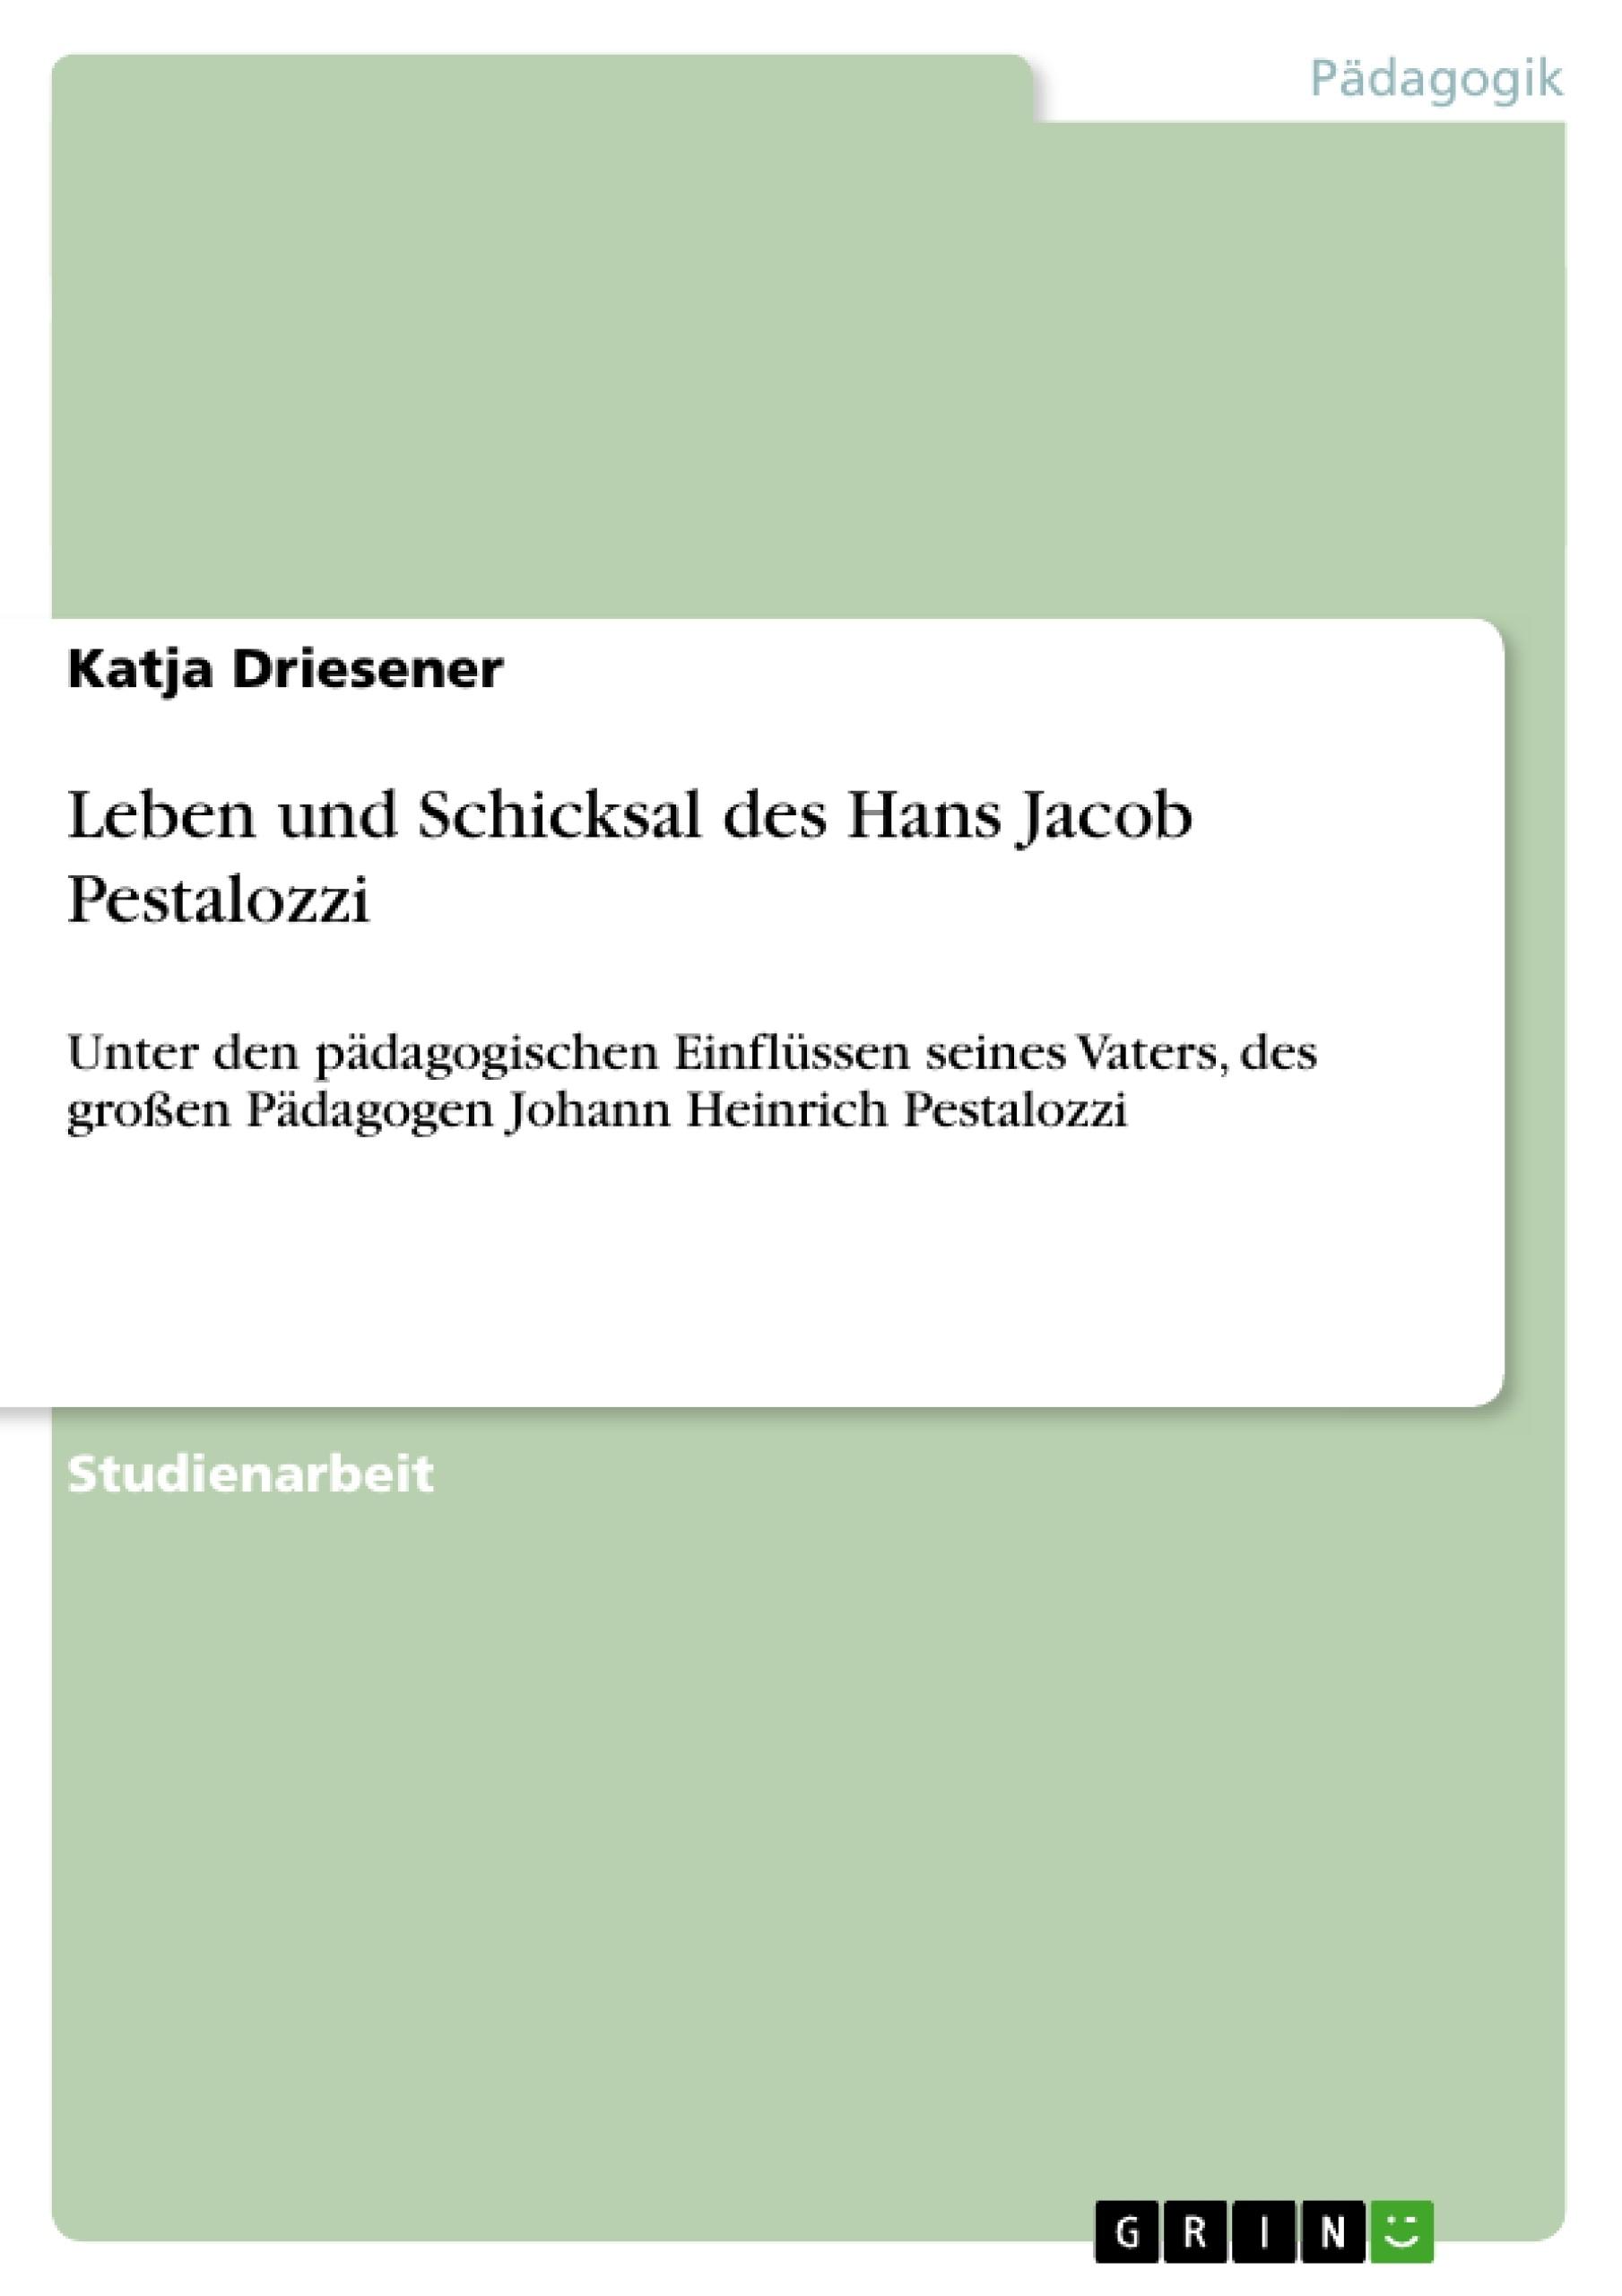 Titel: Leben und Schicksal des Hans Jacob  Pestalozzi